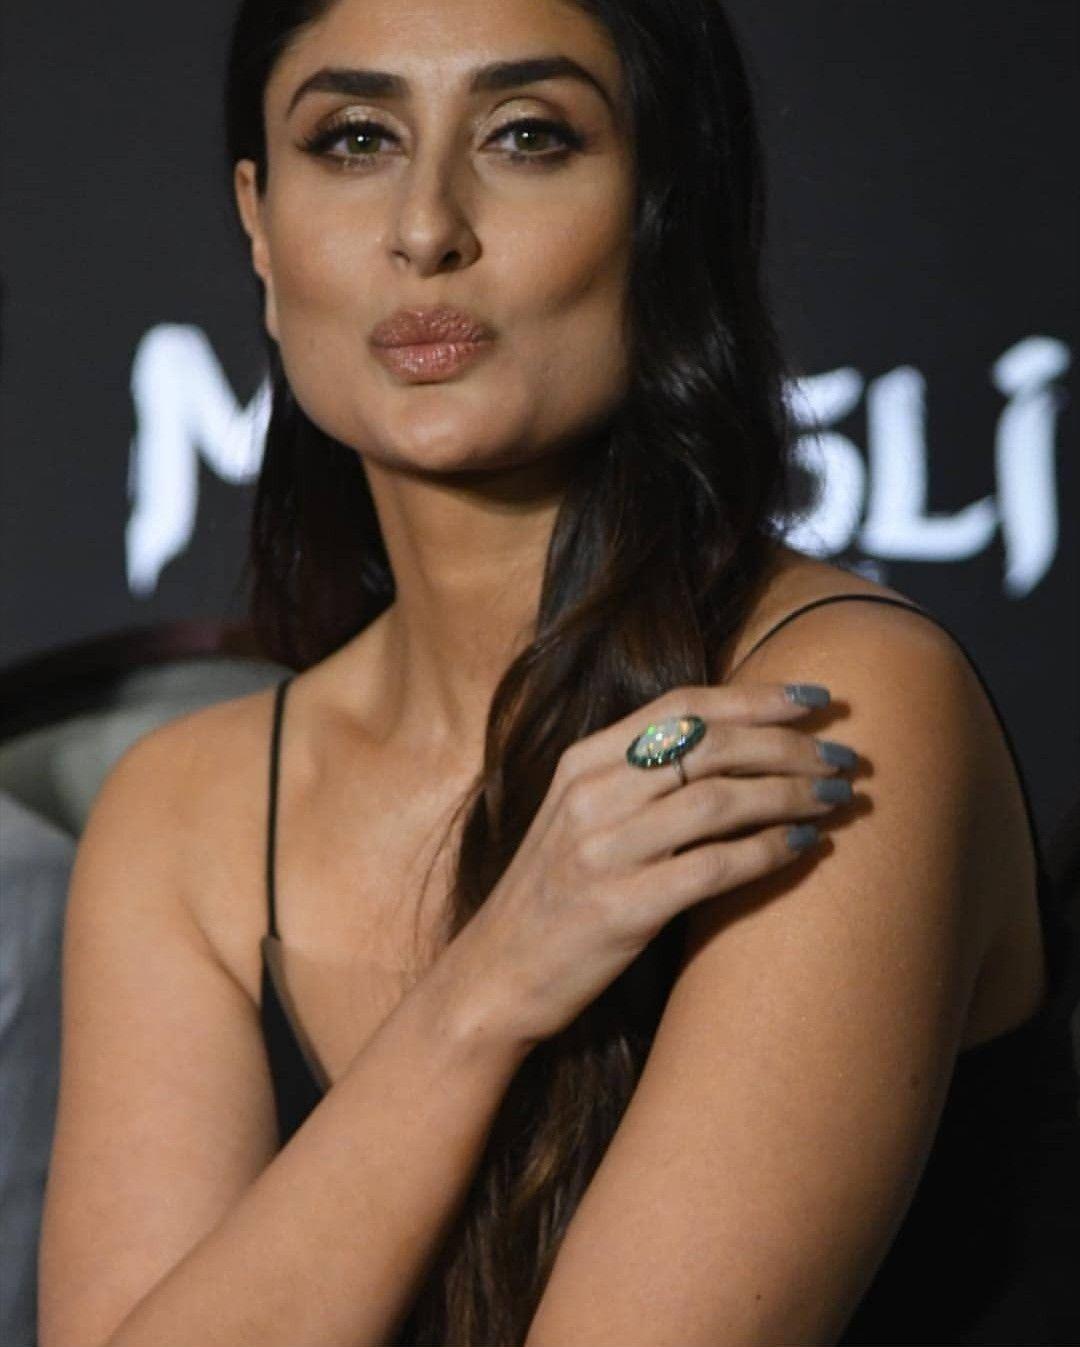 Pin by Kumar Raj on Kareena Kapoor Khan | Kareena kapoor ...